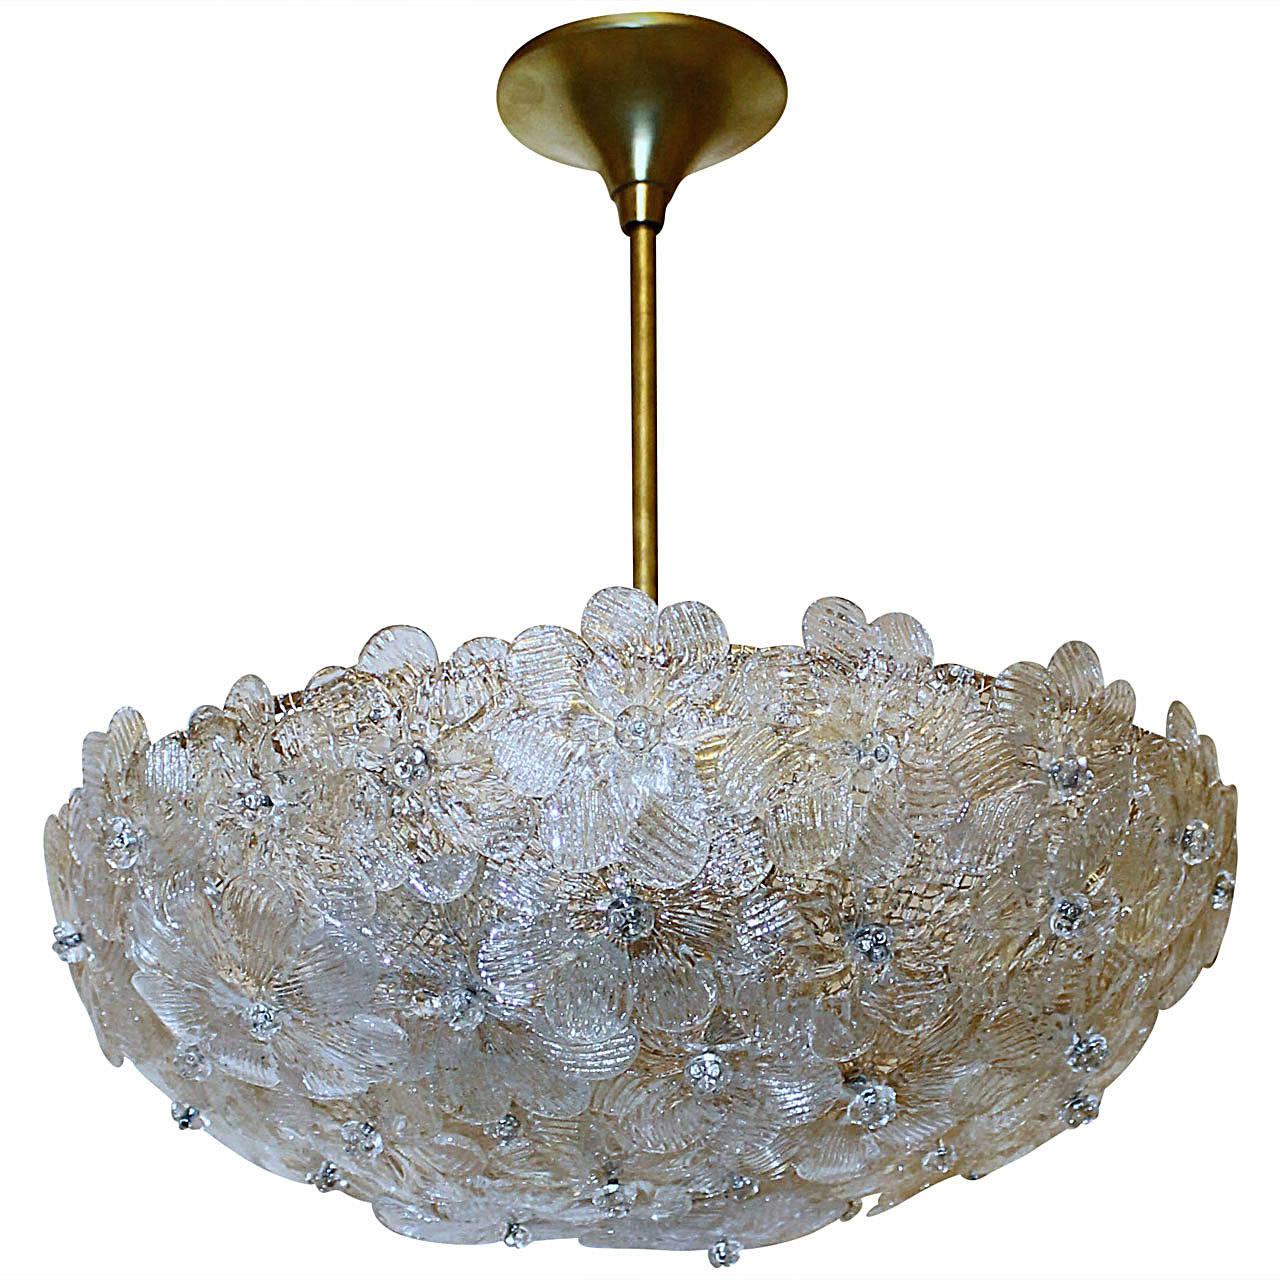 Barovier Murano Glass Floral Ceiling Pendant Light